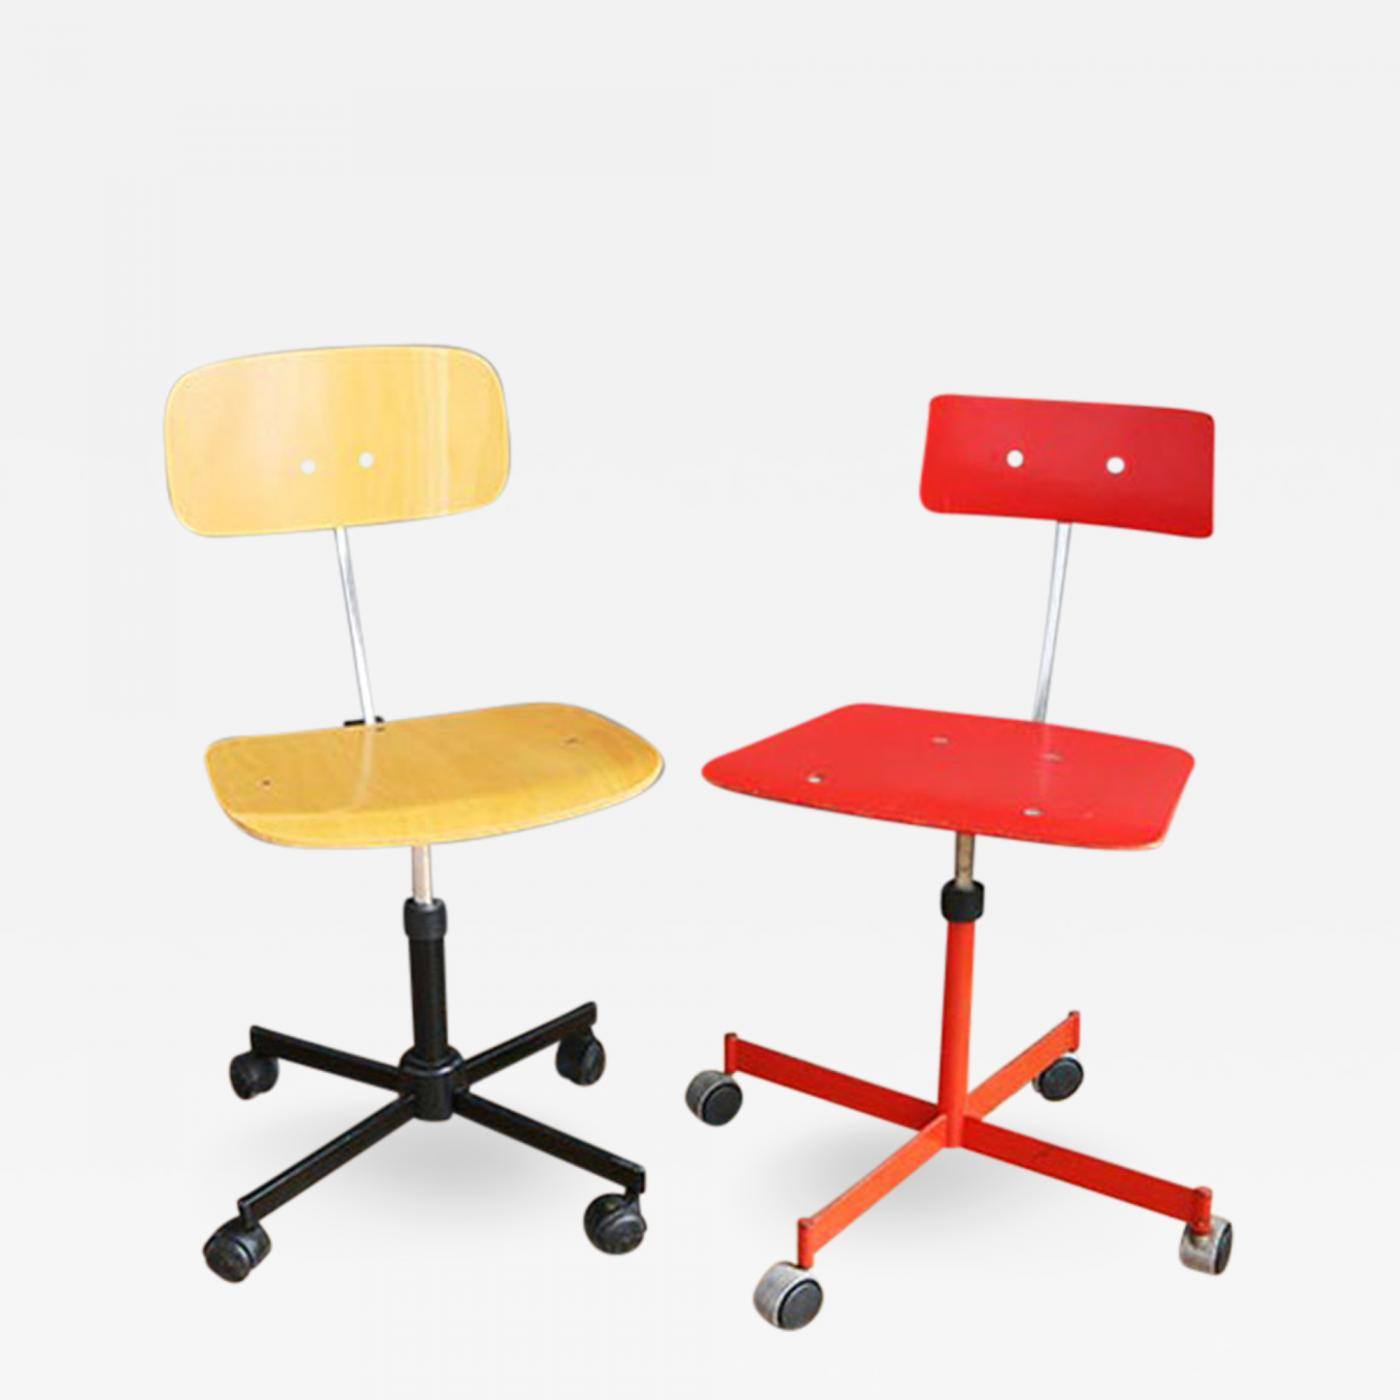 Ib & Jorgen Rasmussen Kevi Adjustable Desk Chairs